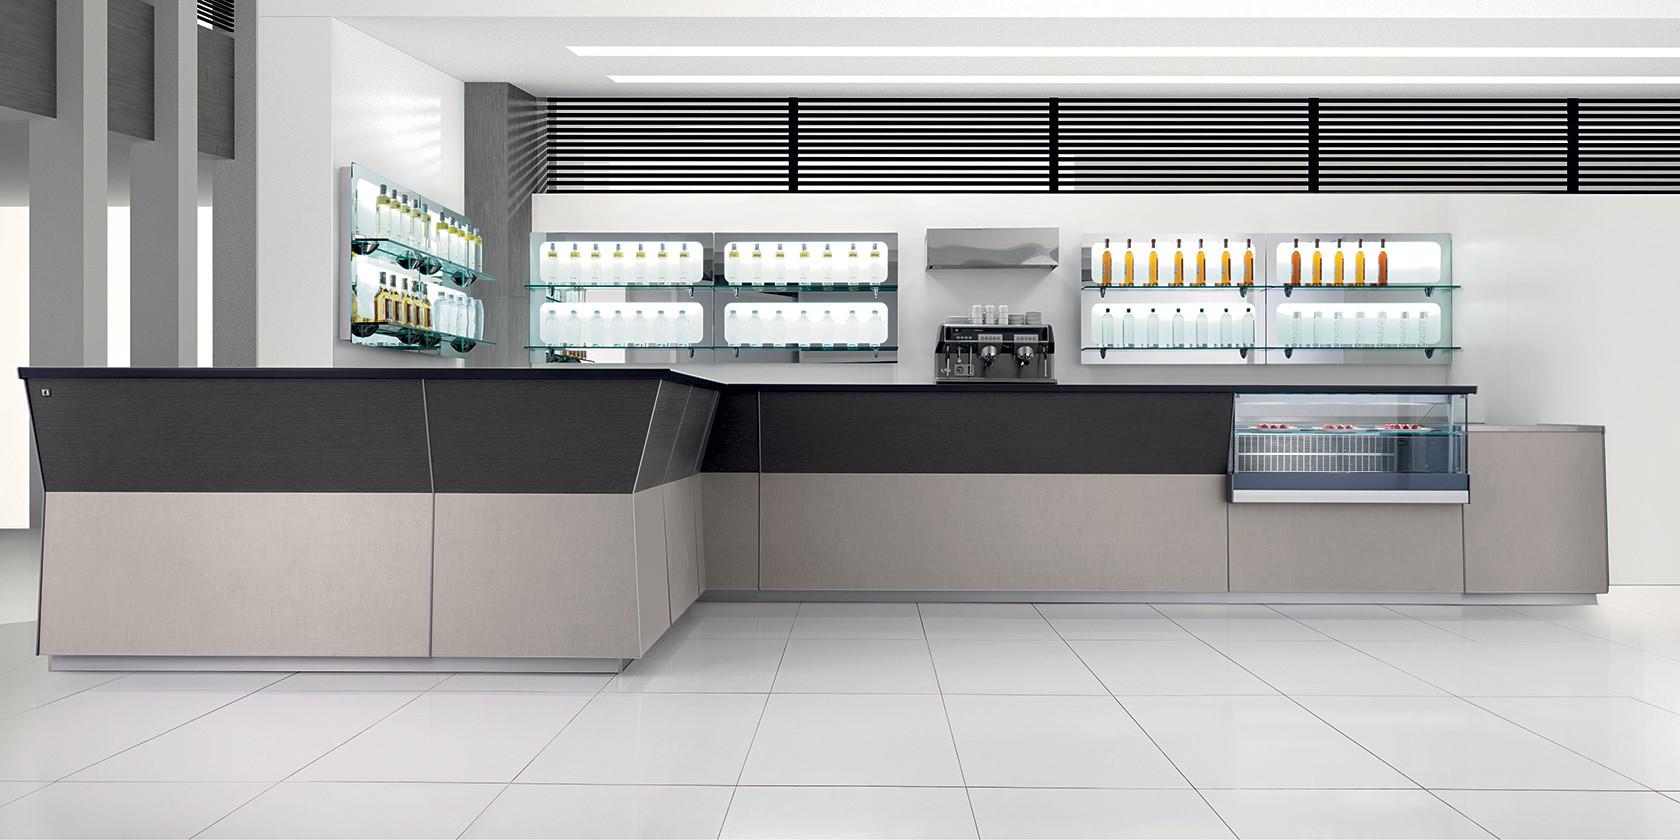 Banco bar kir dal design design lineare e pulito dbanchibar for Banco bar moderno